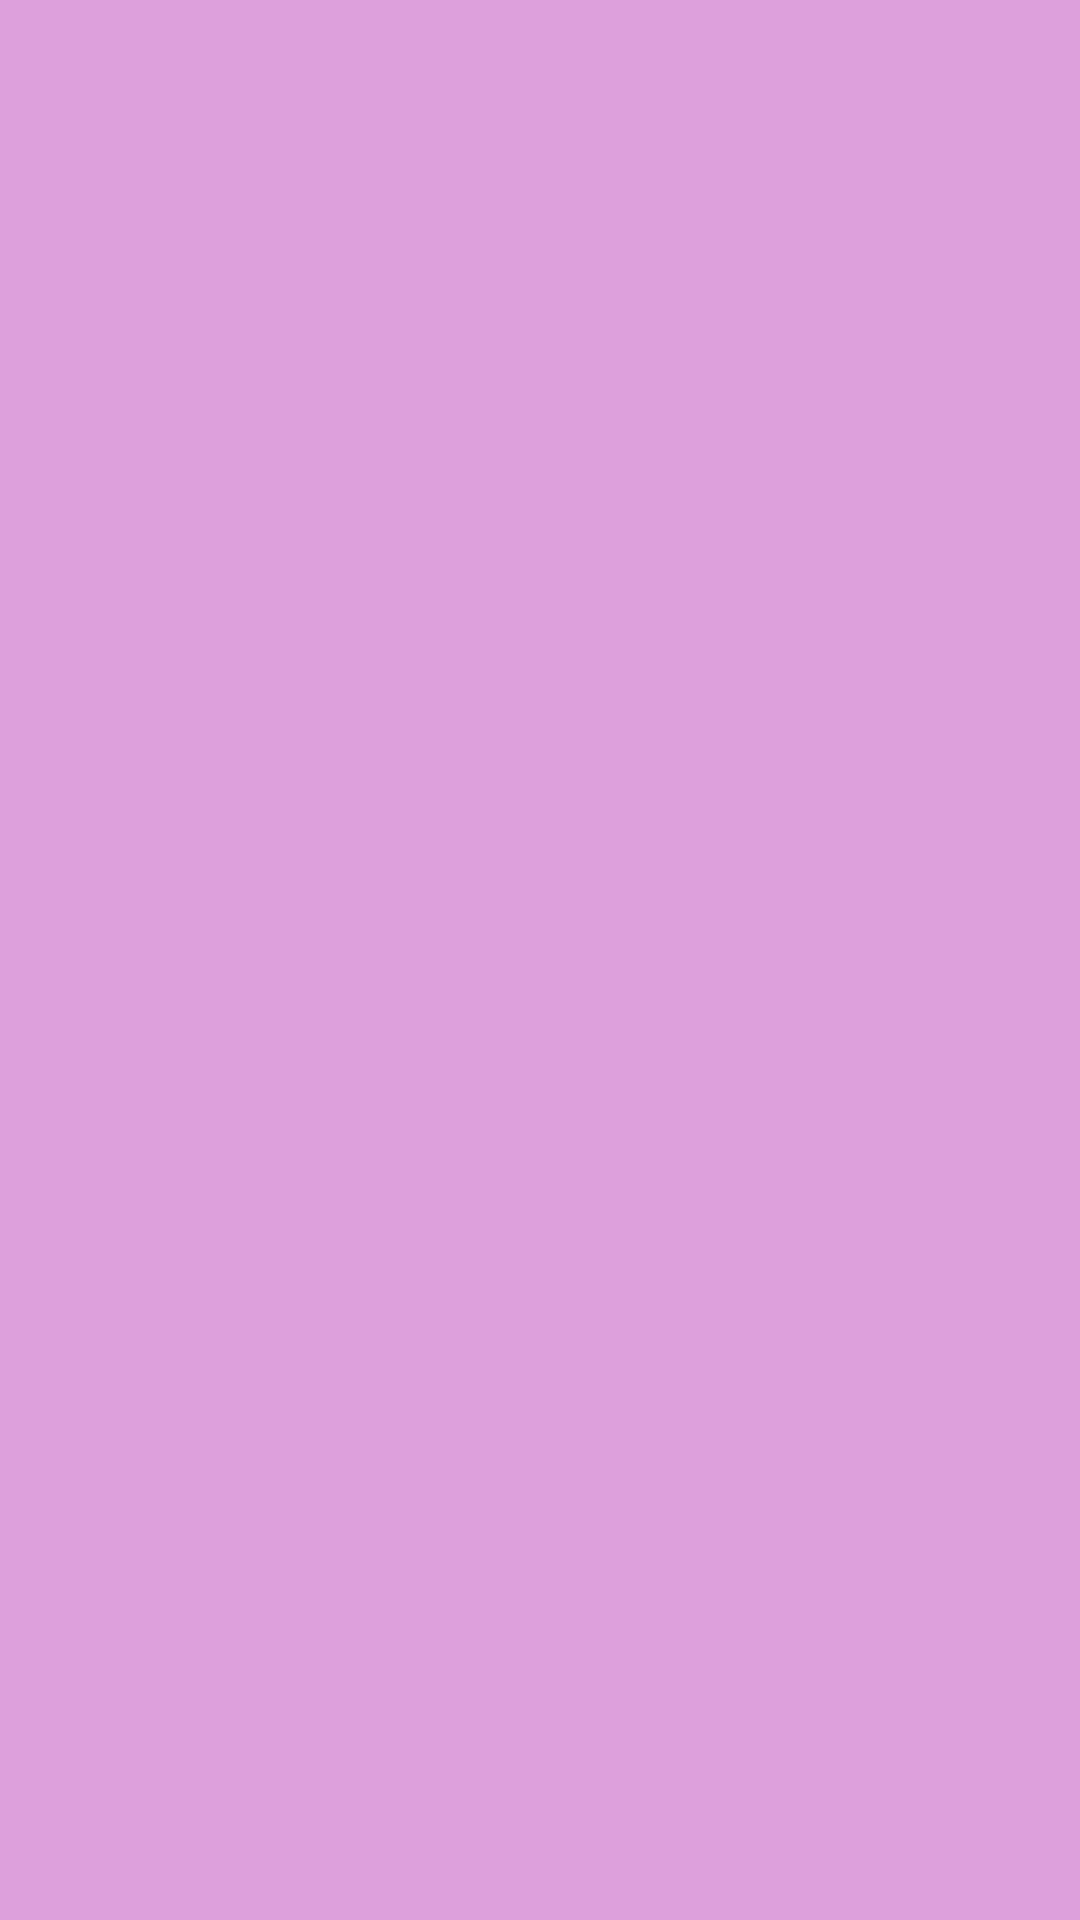 1080x1920 Medium Lavender Magenta Solid Color Background